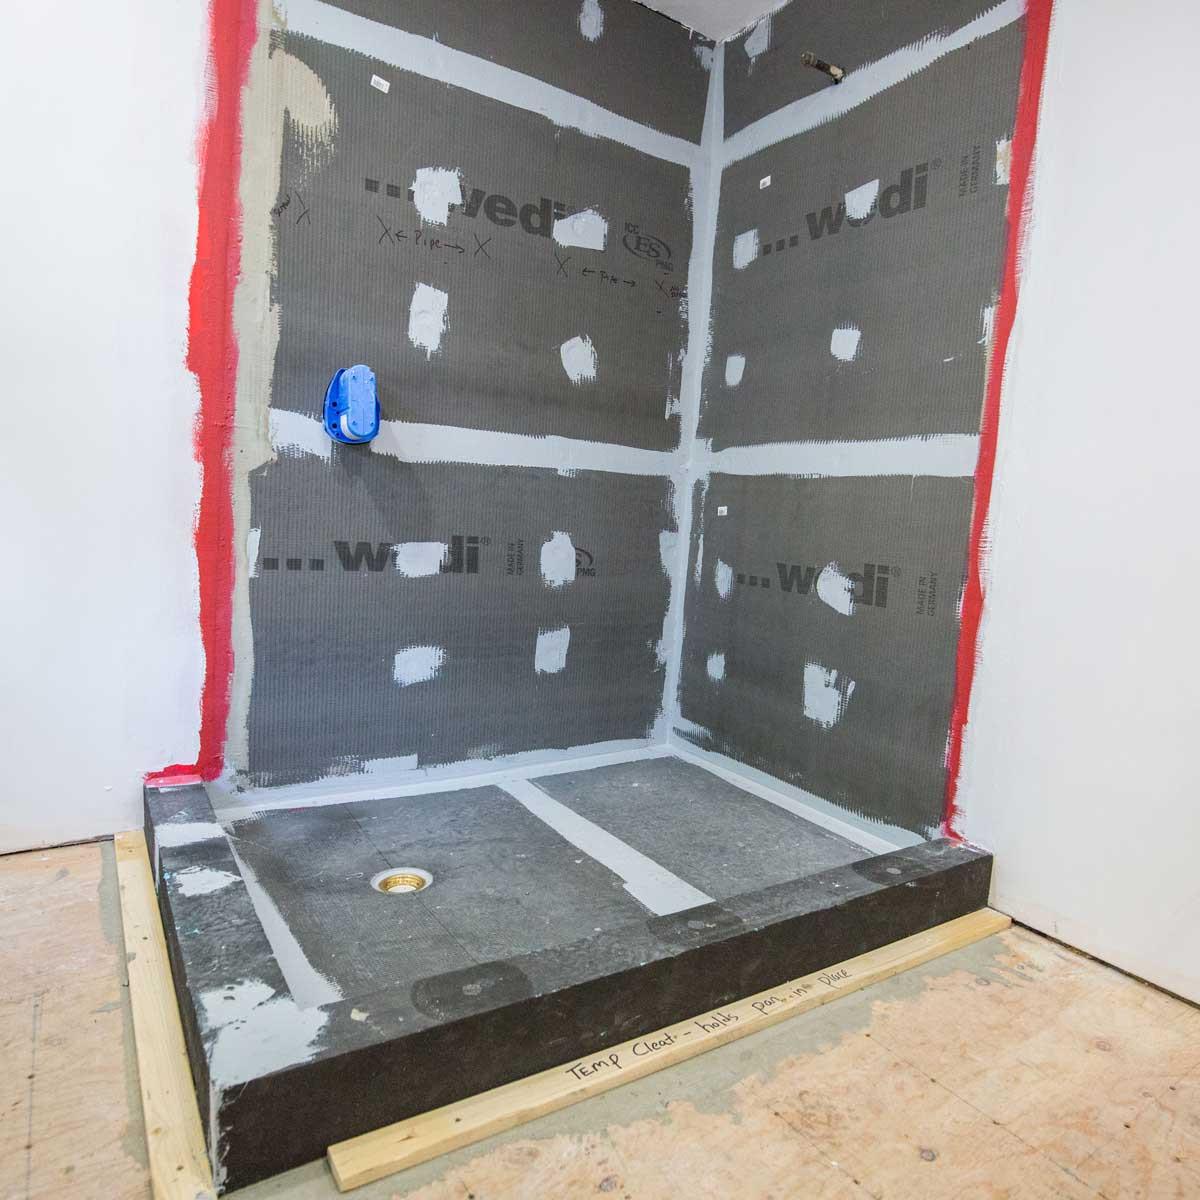 36 x 60inch Offset Drain Wedi Ecobath OneStep Shower Base